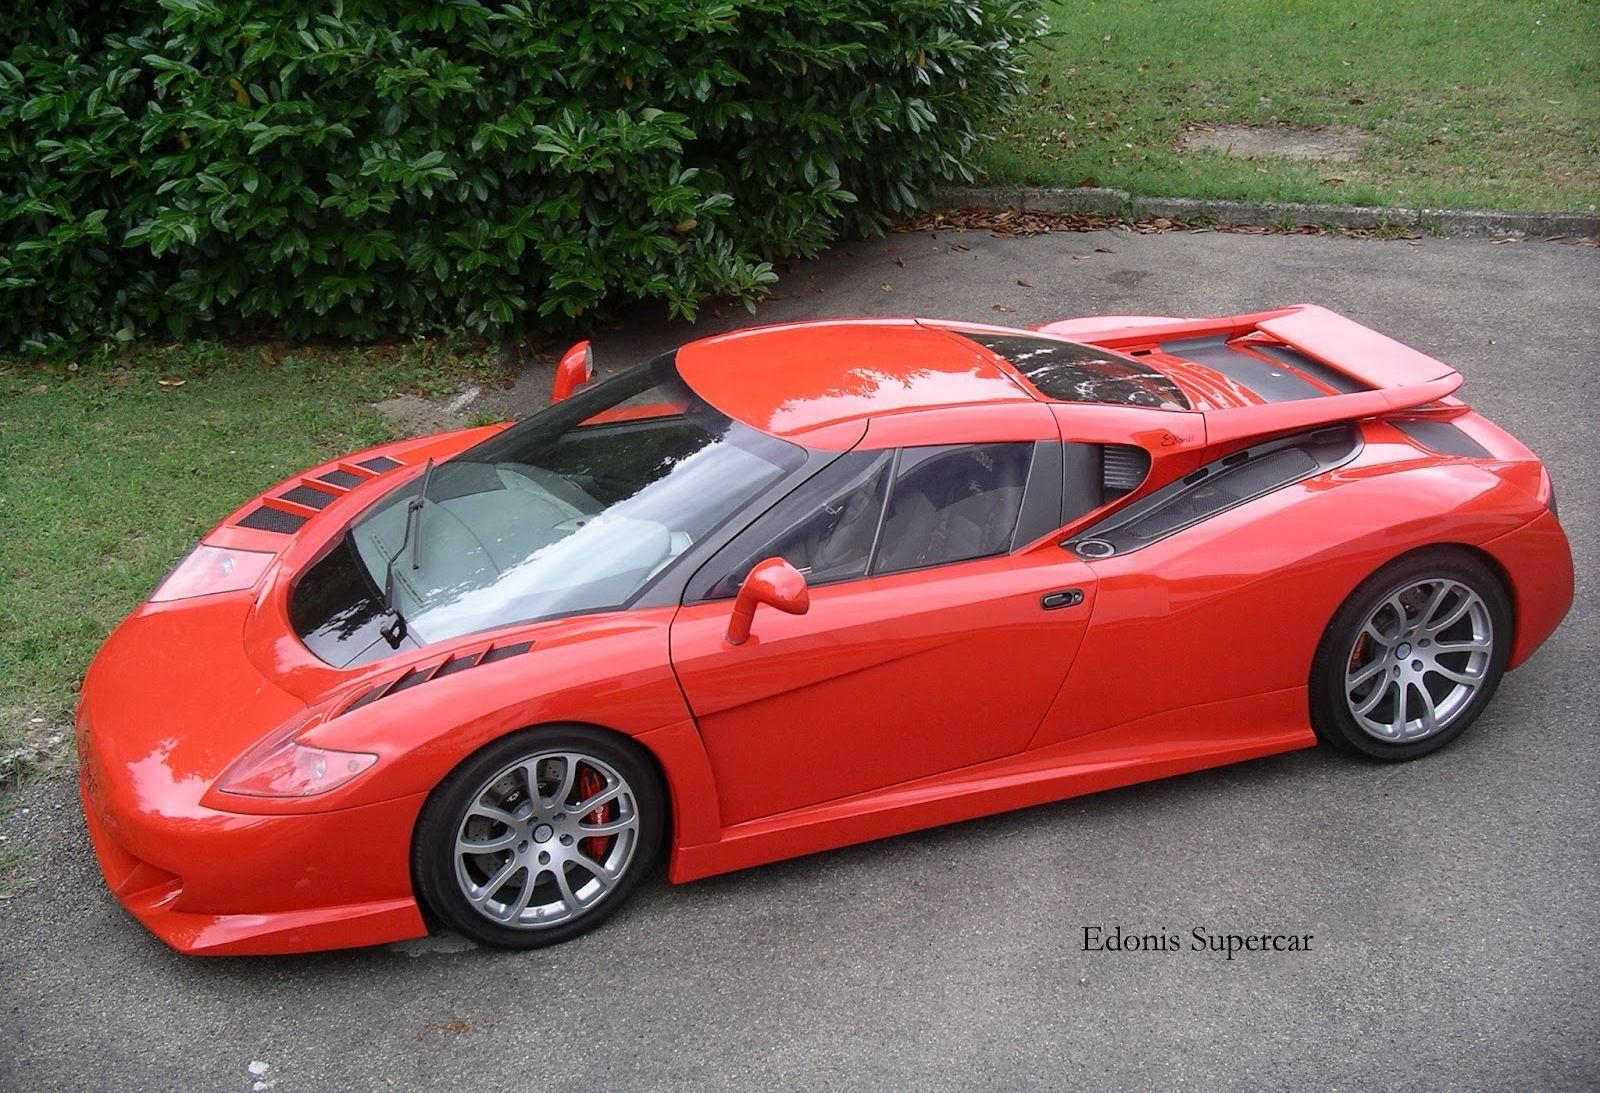 Edonis Supercar Super Cars Sports Cars Car Brands